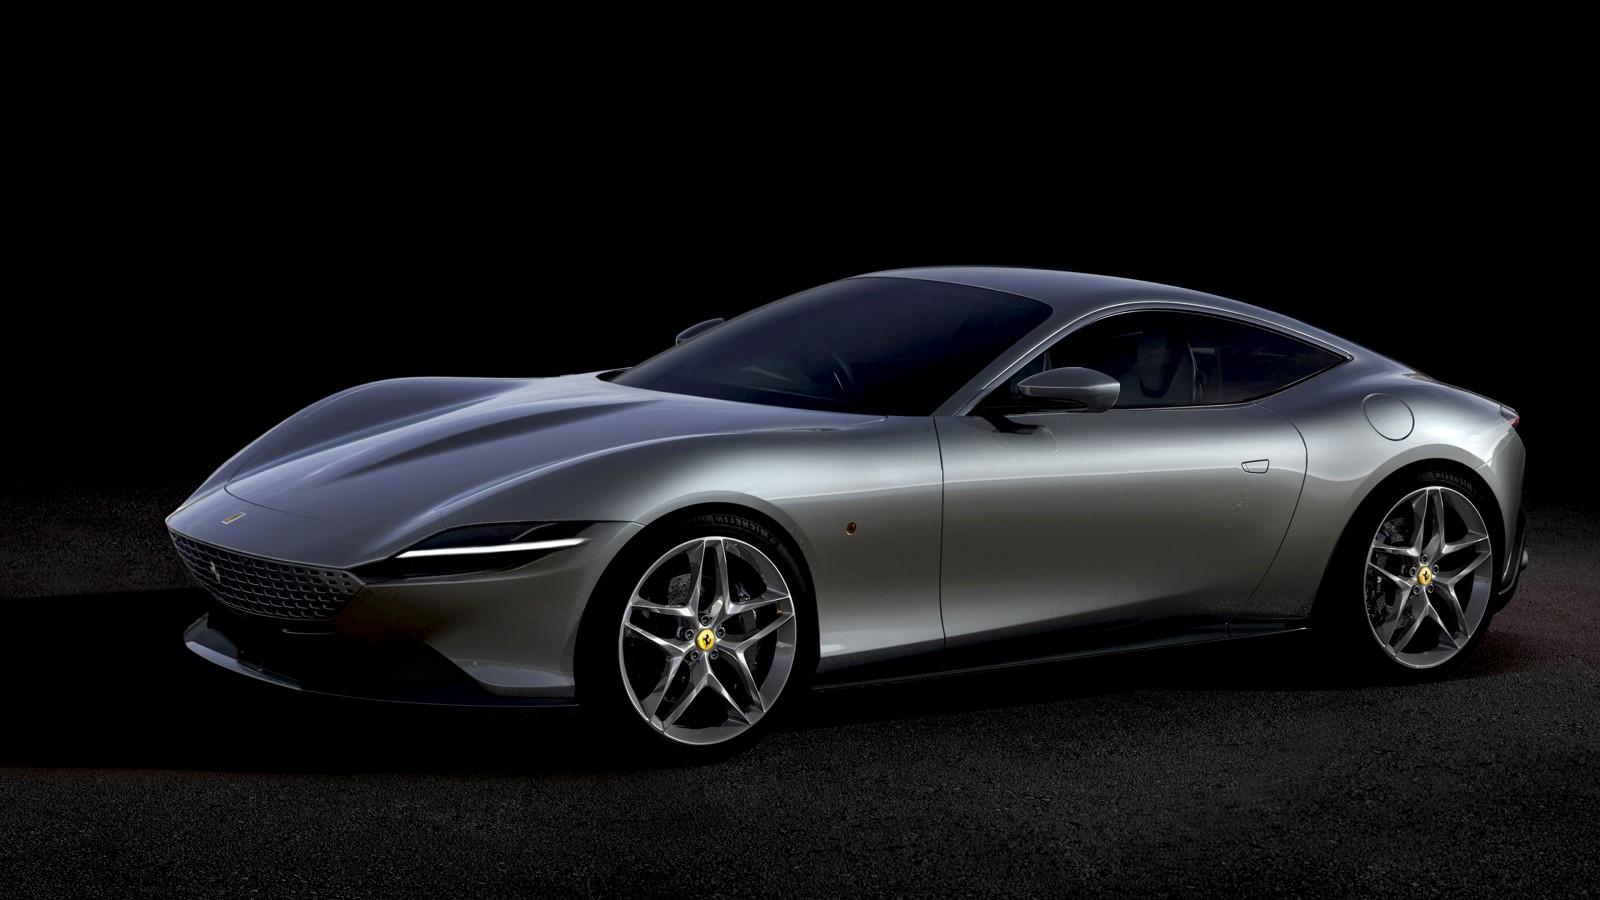 Ferrari Roma 2020 4k Wallpapers Hd Wallpapers Id 29871